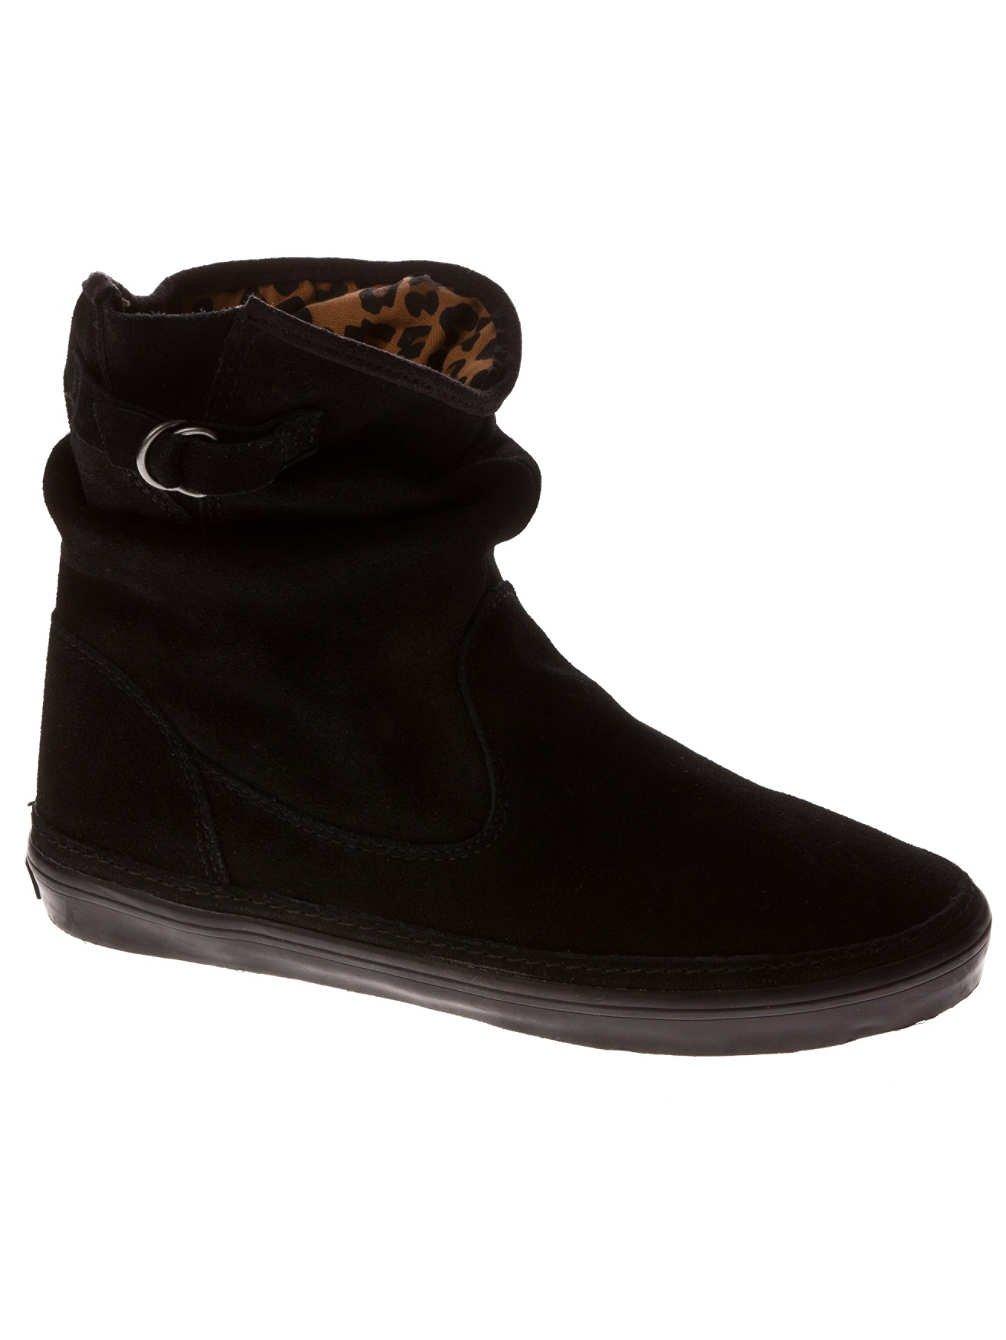 Vans Damen Stiefel Prairie Boot Women (Suede) BlackLeopard